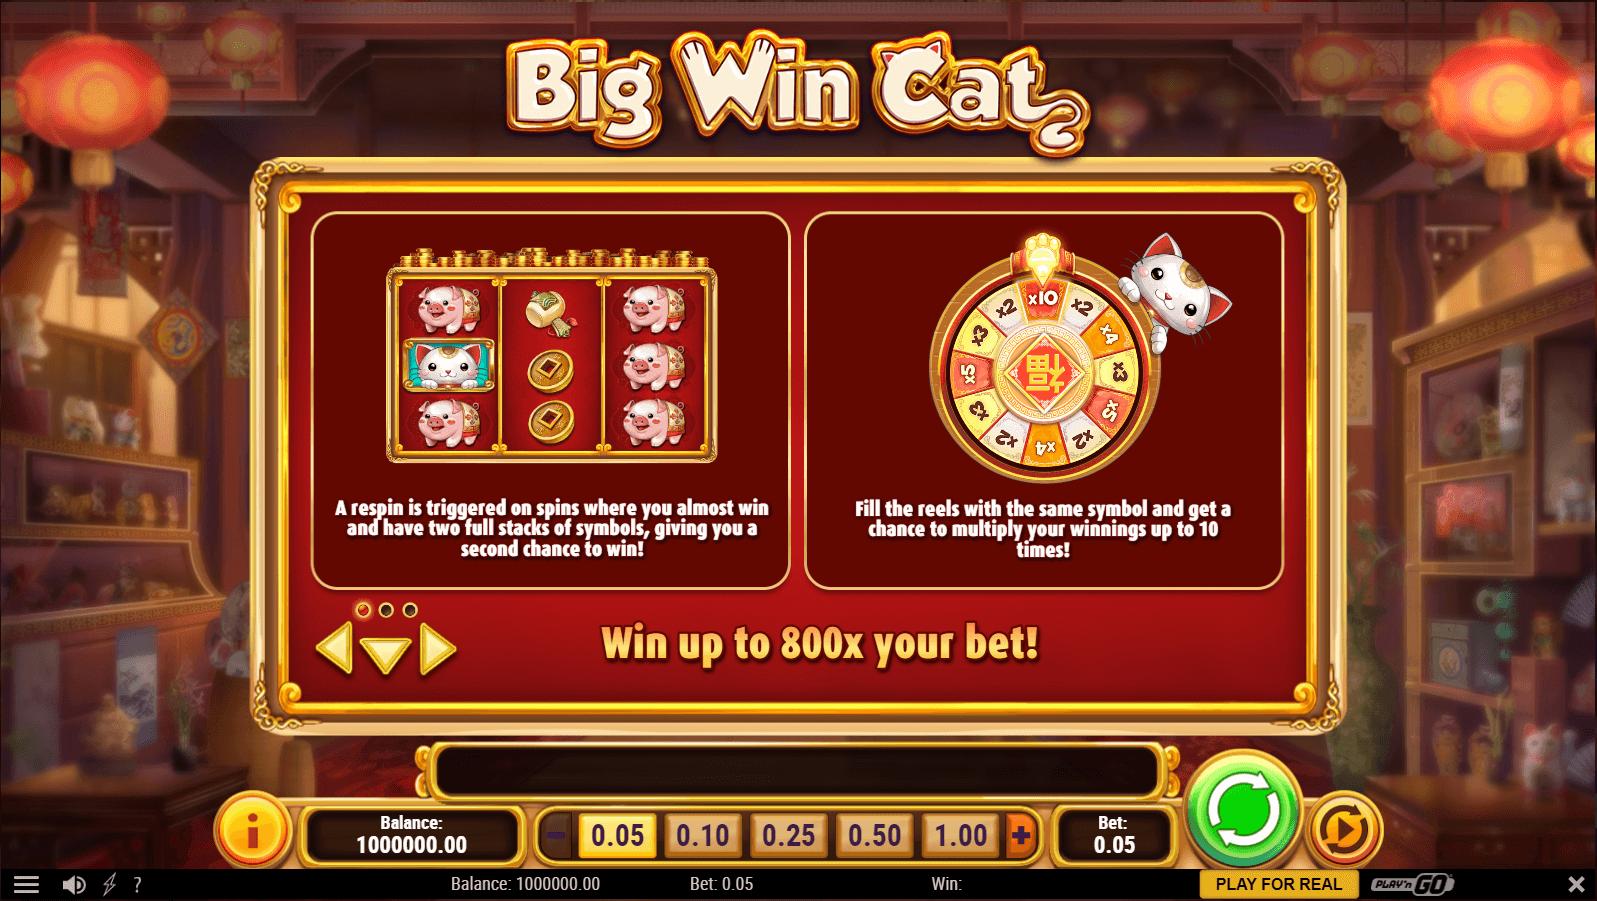 Big Win Cat Slot Machine